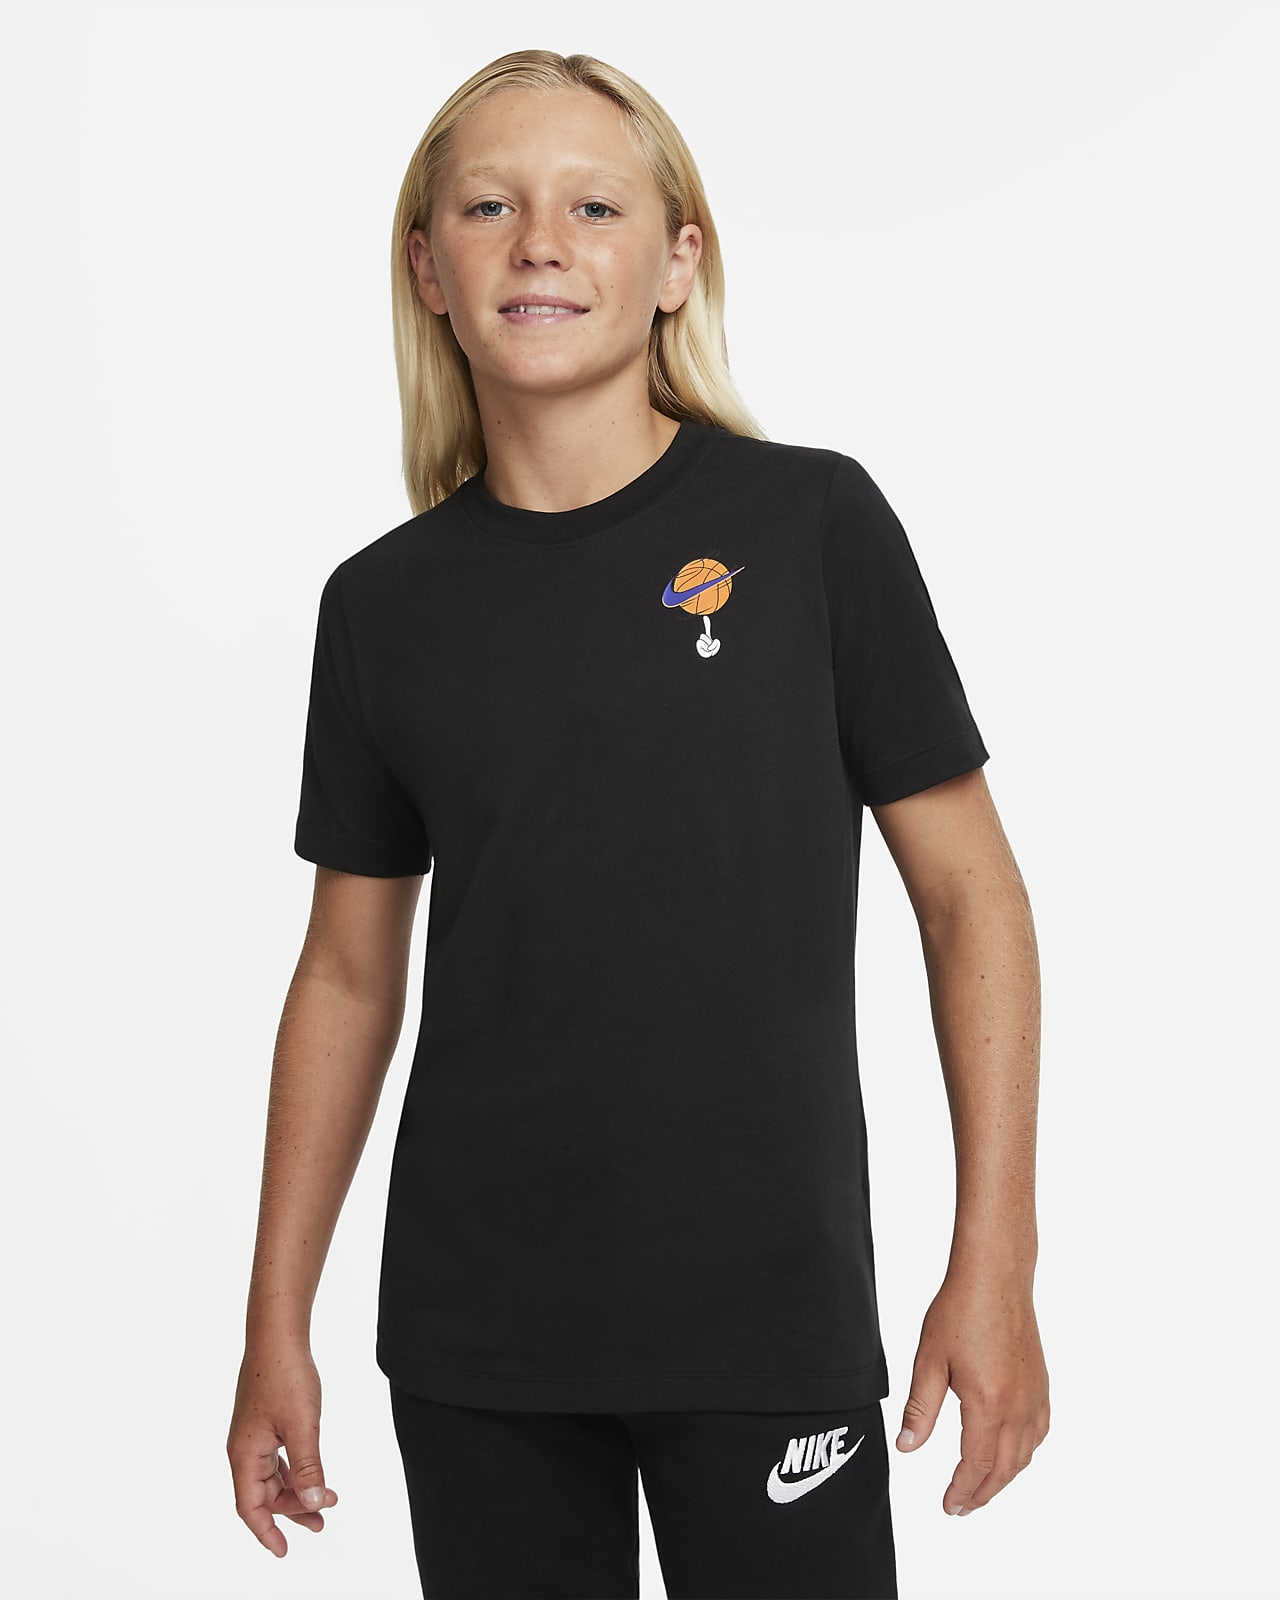 T-shirt da training Nike Dri-FIT x Space Jam: A New Legacy - Ragazzi